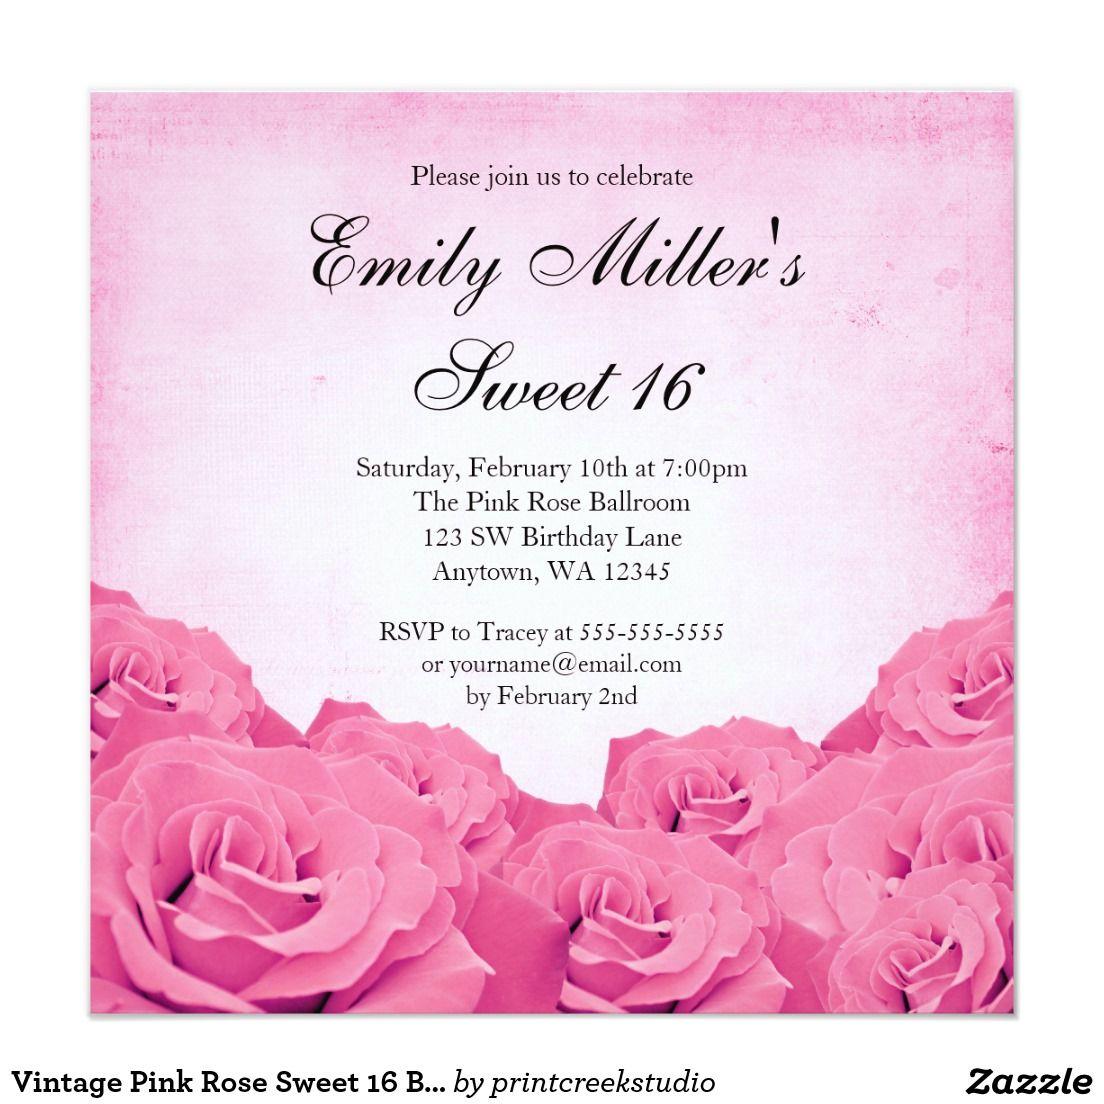 Vintage Pink Rose Sweet 16 Birthday Party Invitation | SWEET SIXTEEN ...